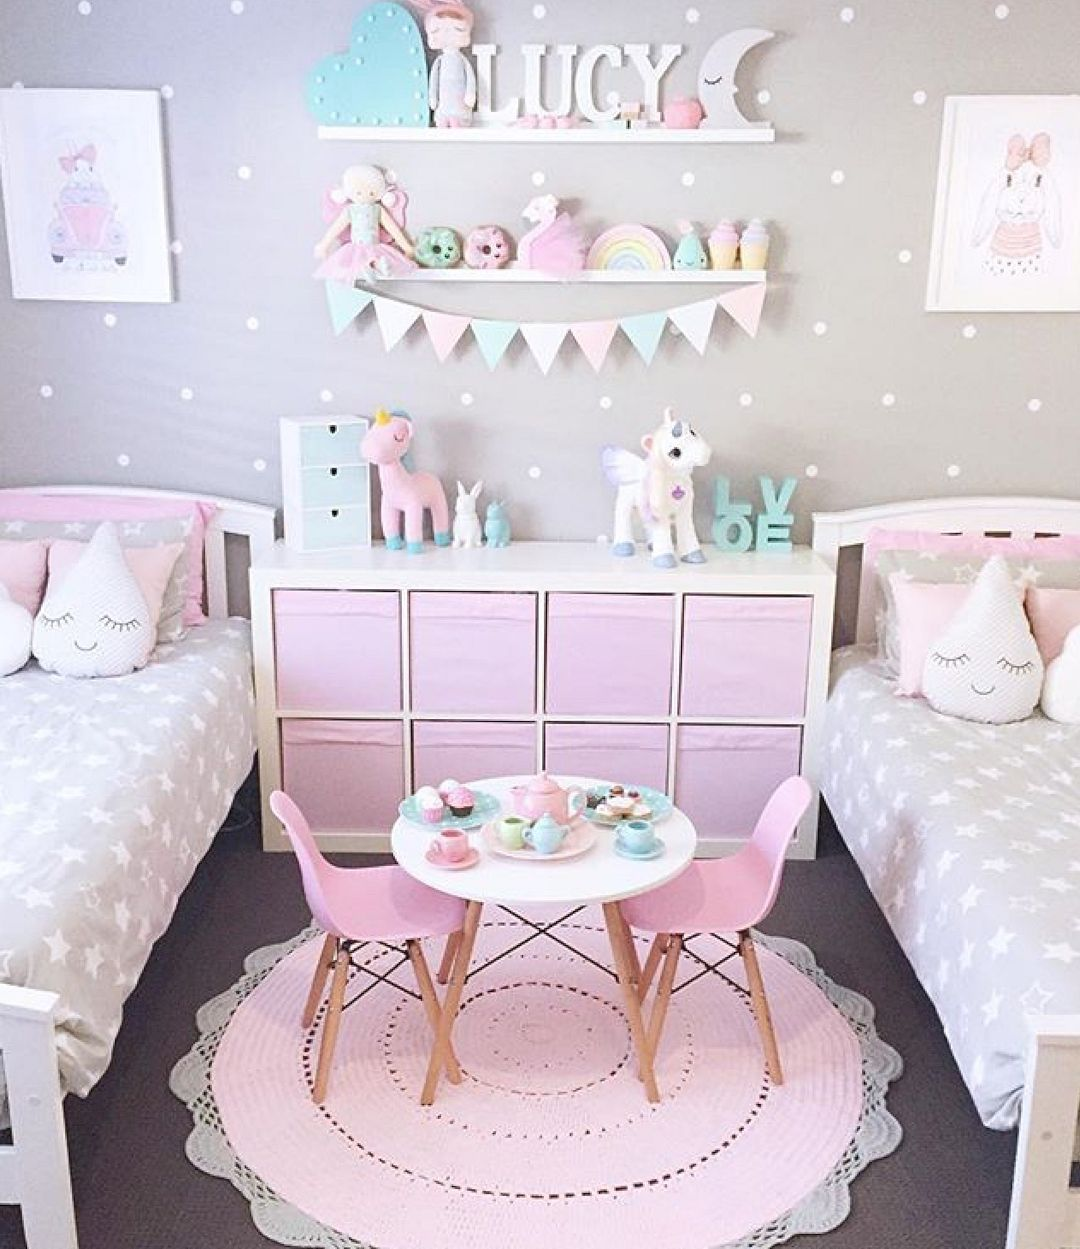 7 Home Decor Ideas For Your Living Room Room Ideas Bedroom Kid Room Decor Girls Bedroom